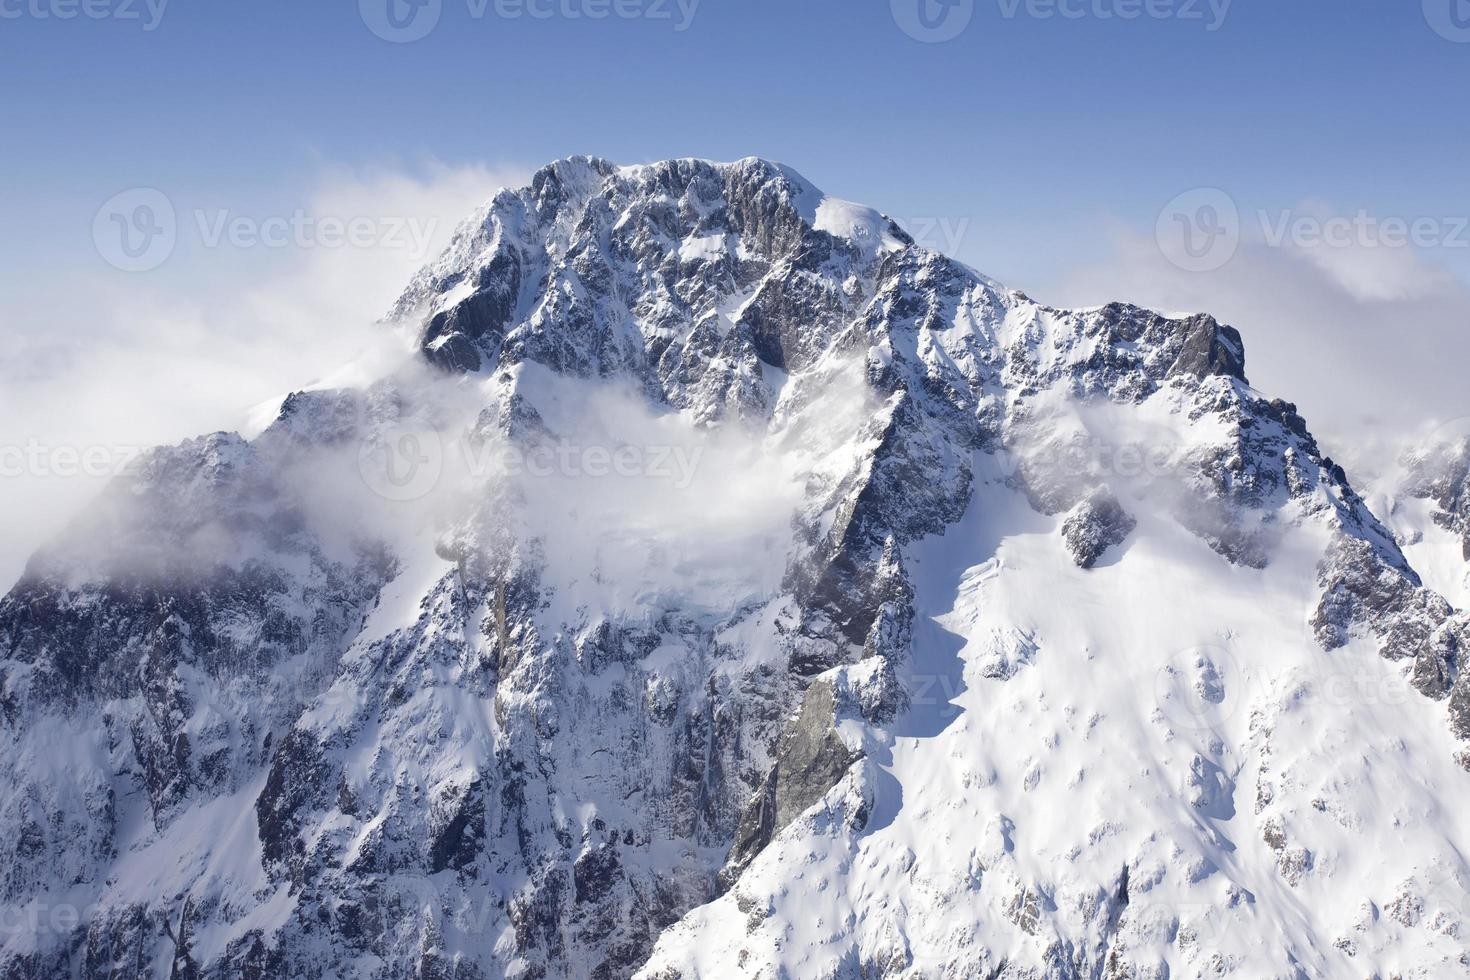 foto aerea della montagna nevosa, Nuova Zelanda